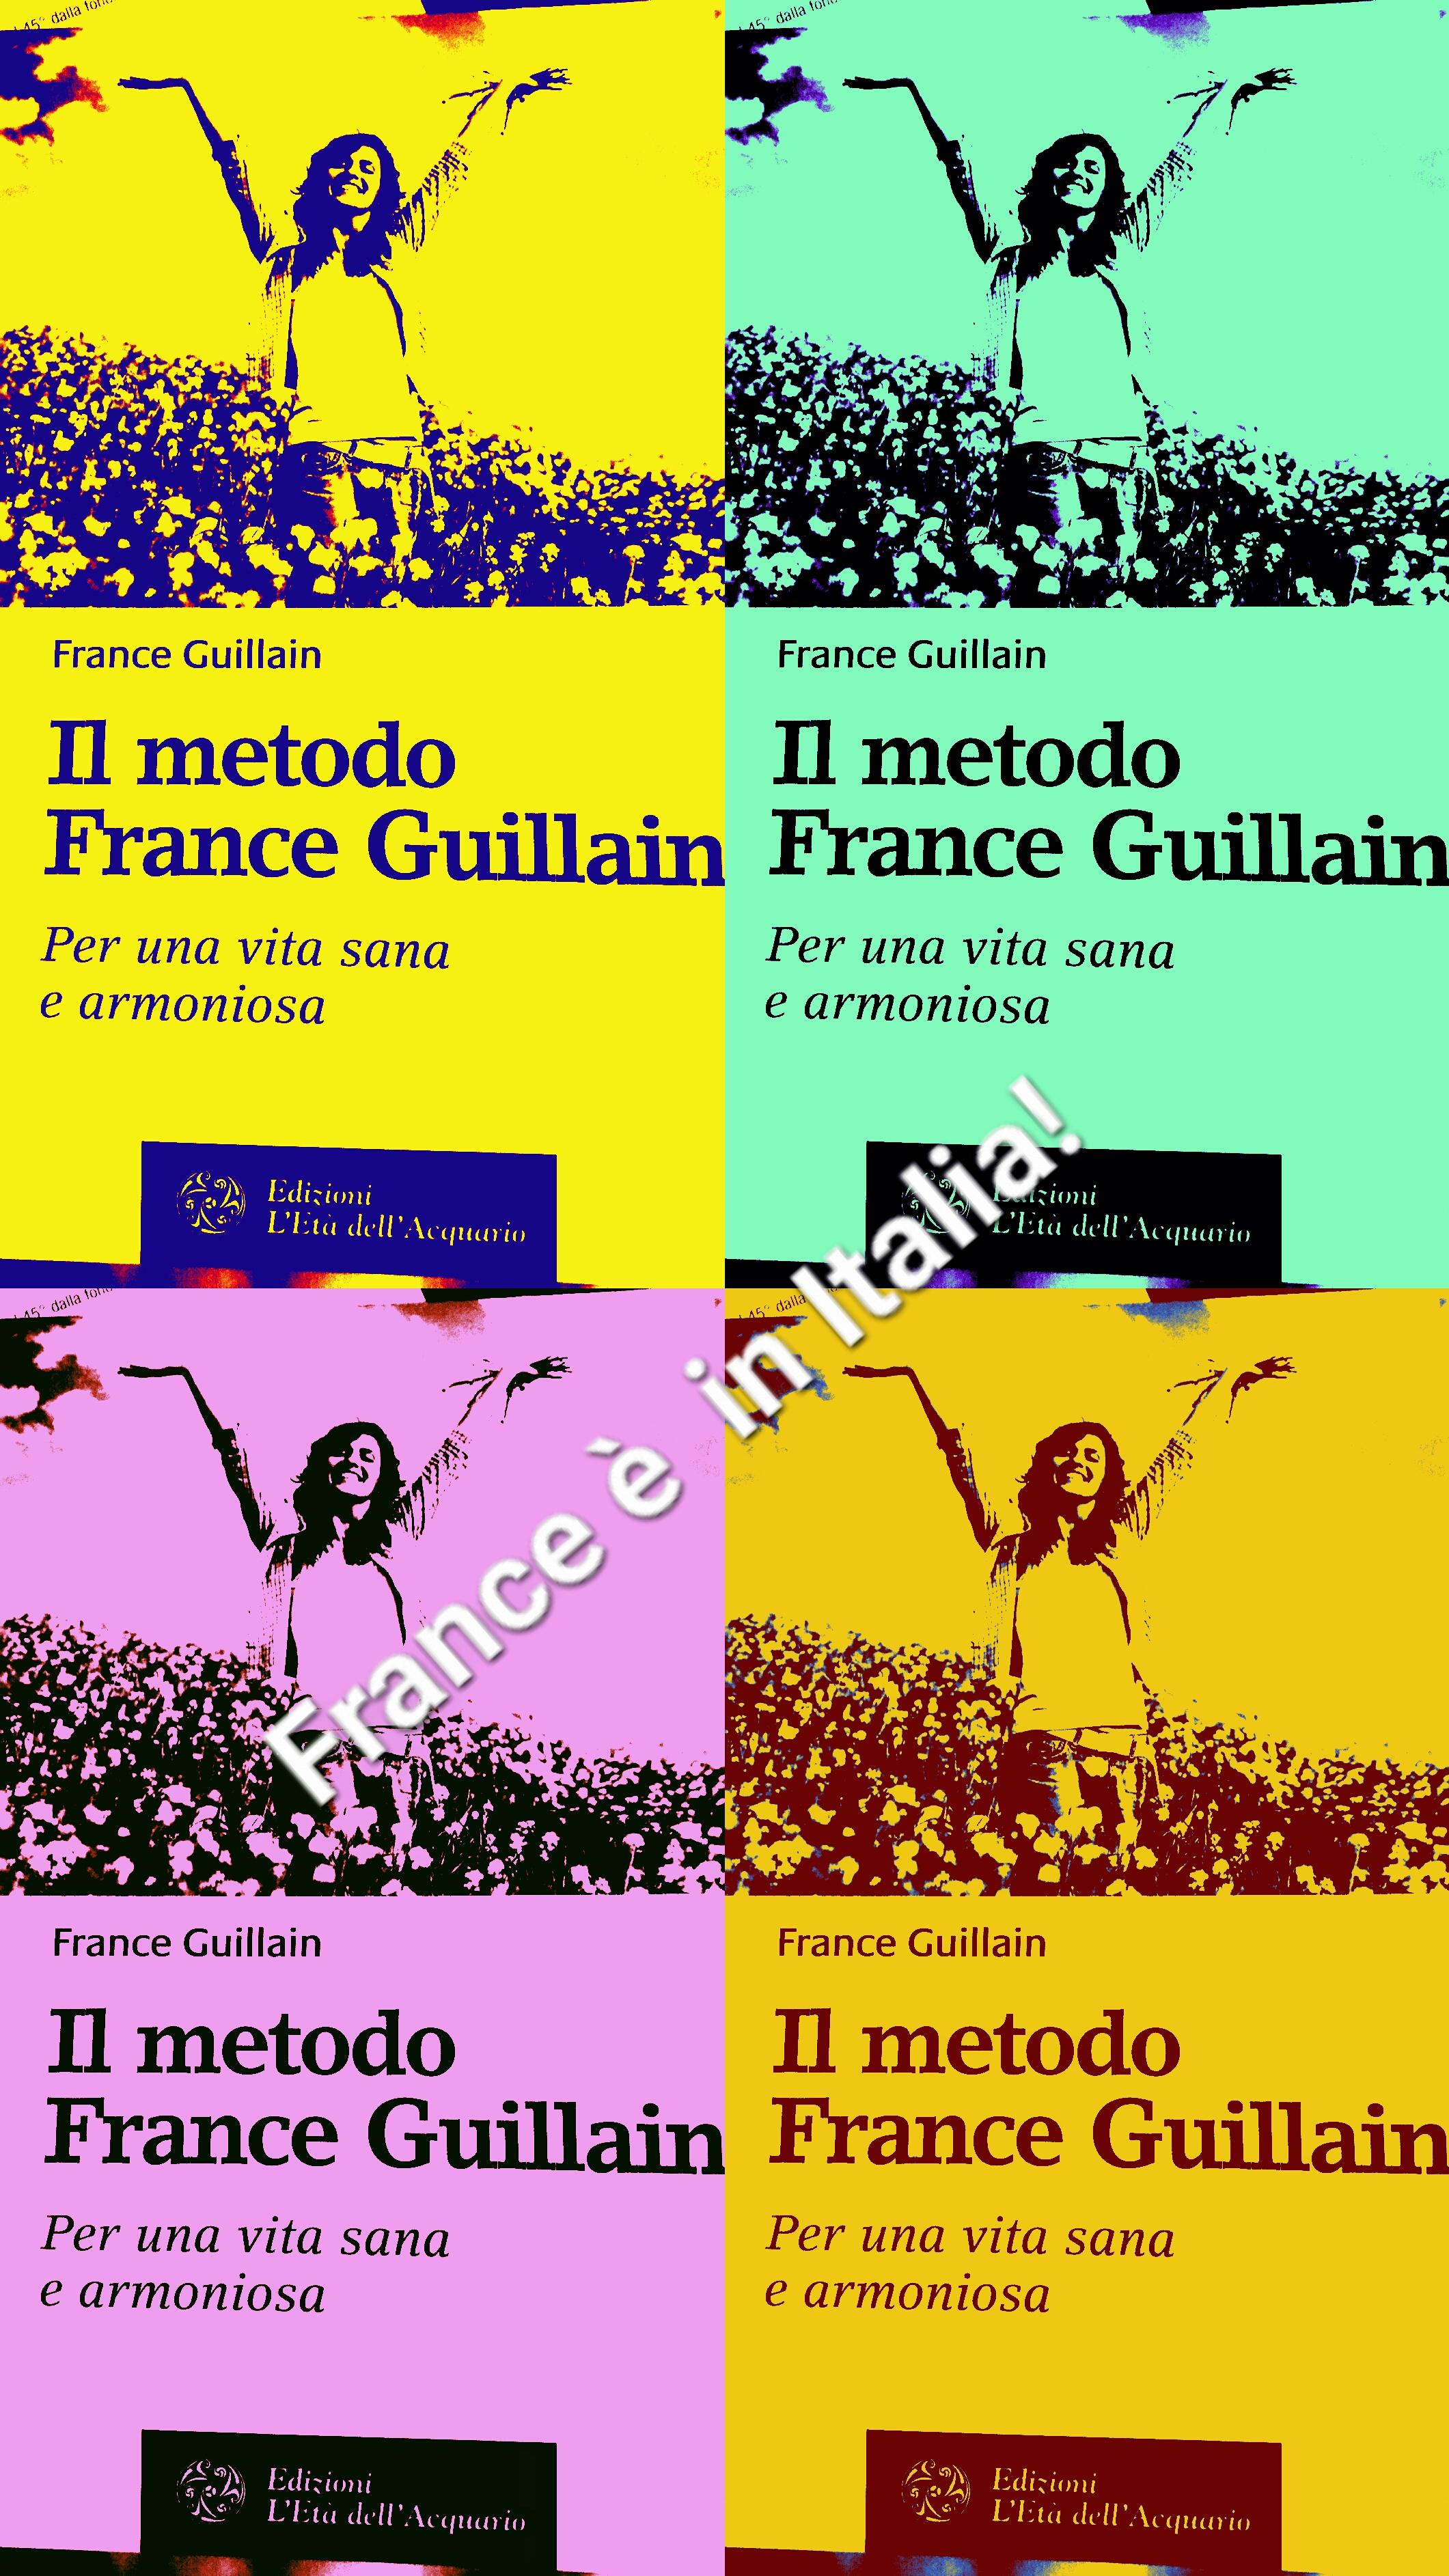 france guillain 2015 04 18 205023